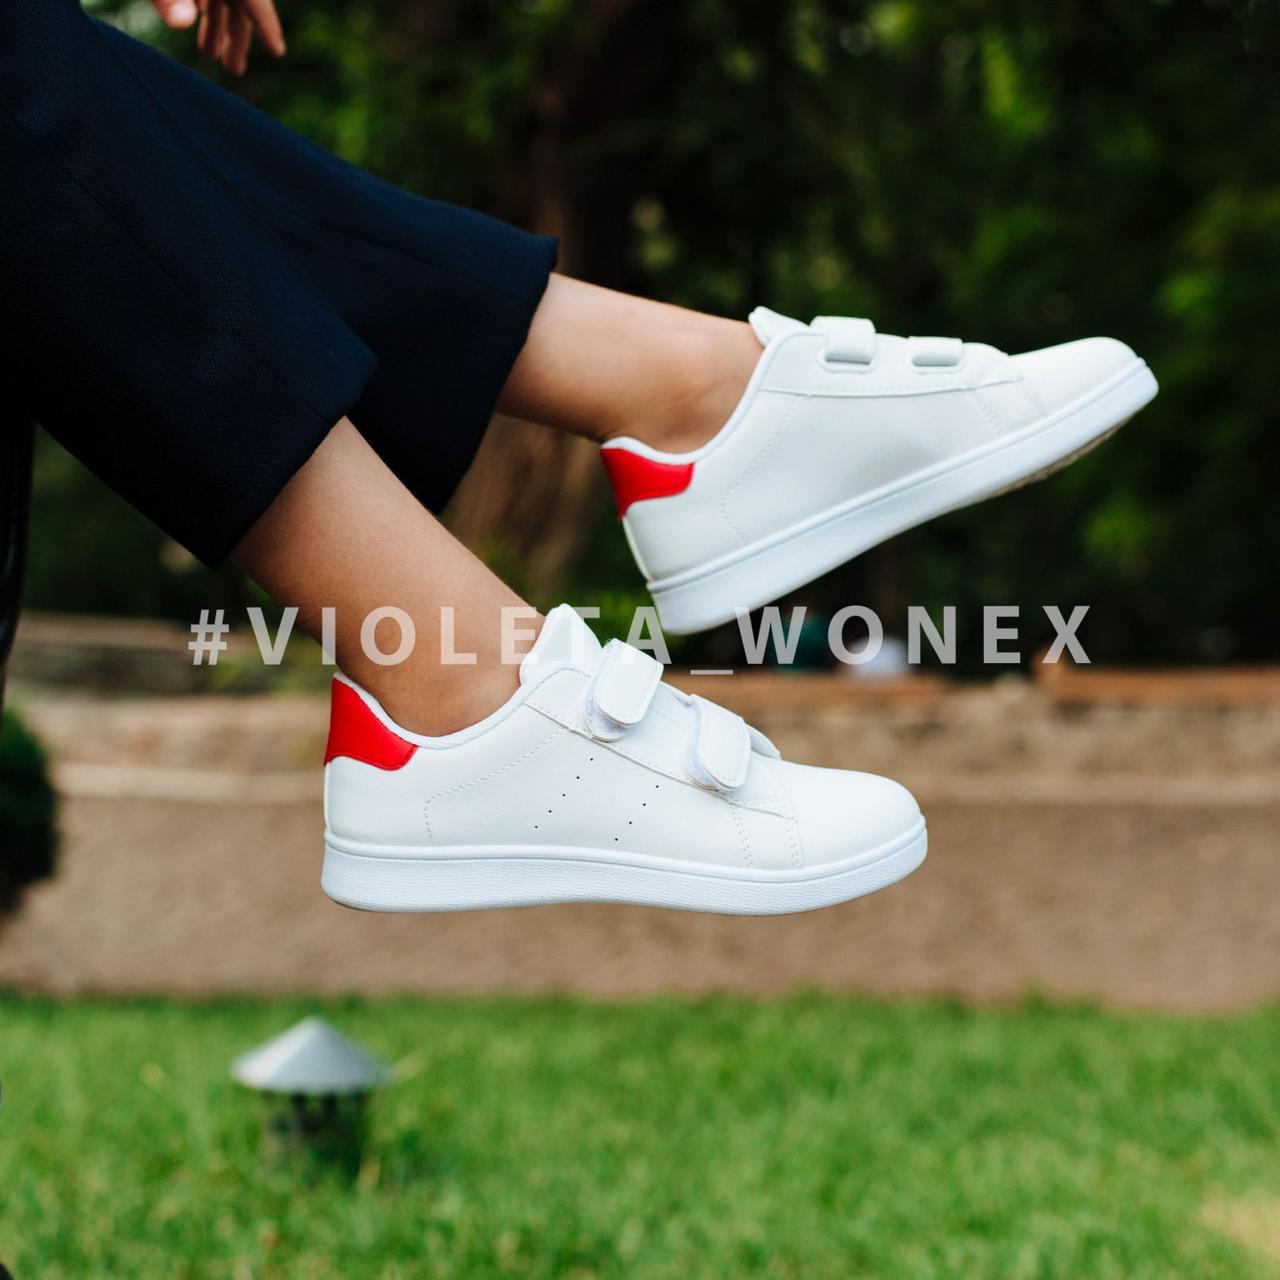 Кеды детские Violeta-Wonex 220-4 white-red